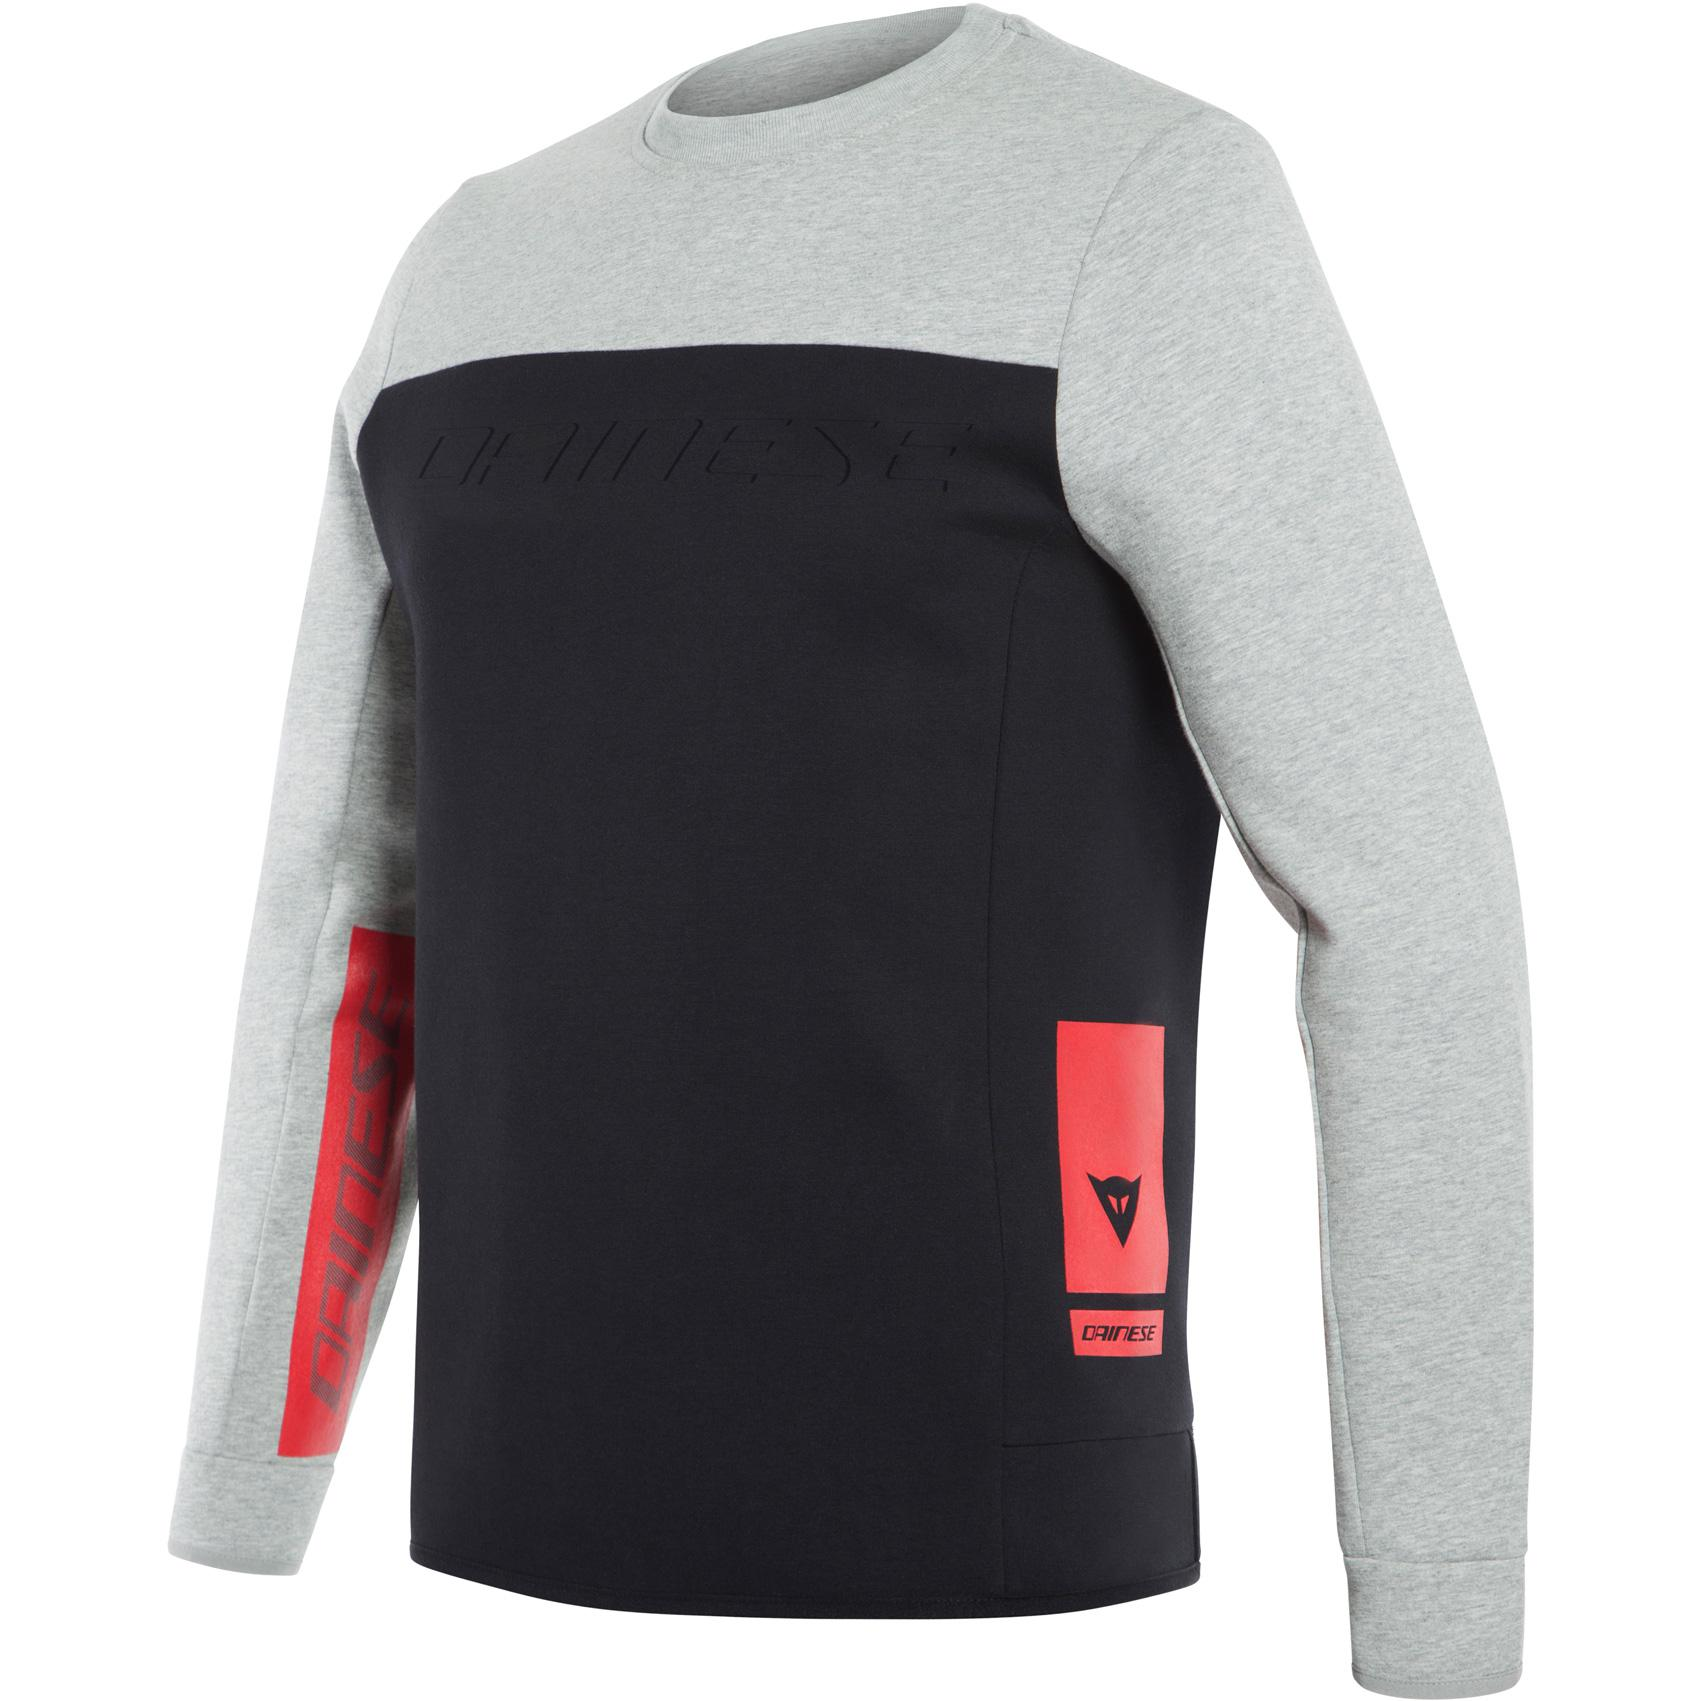 DAINESE-t-shirt-contrast-sweatshirt-image-10938887